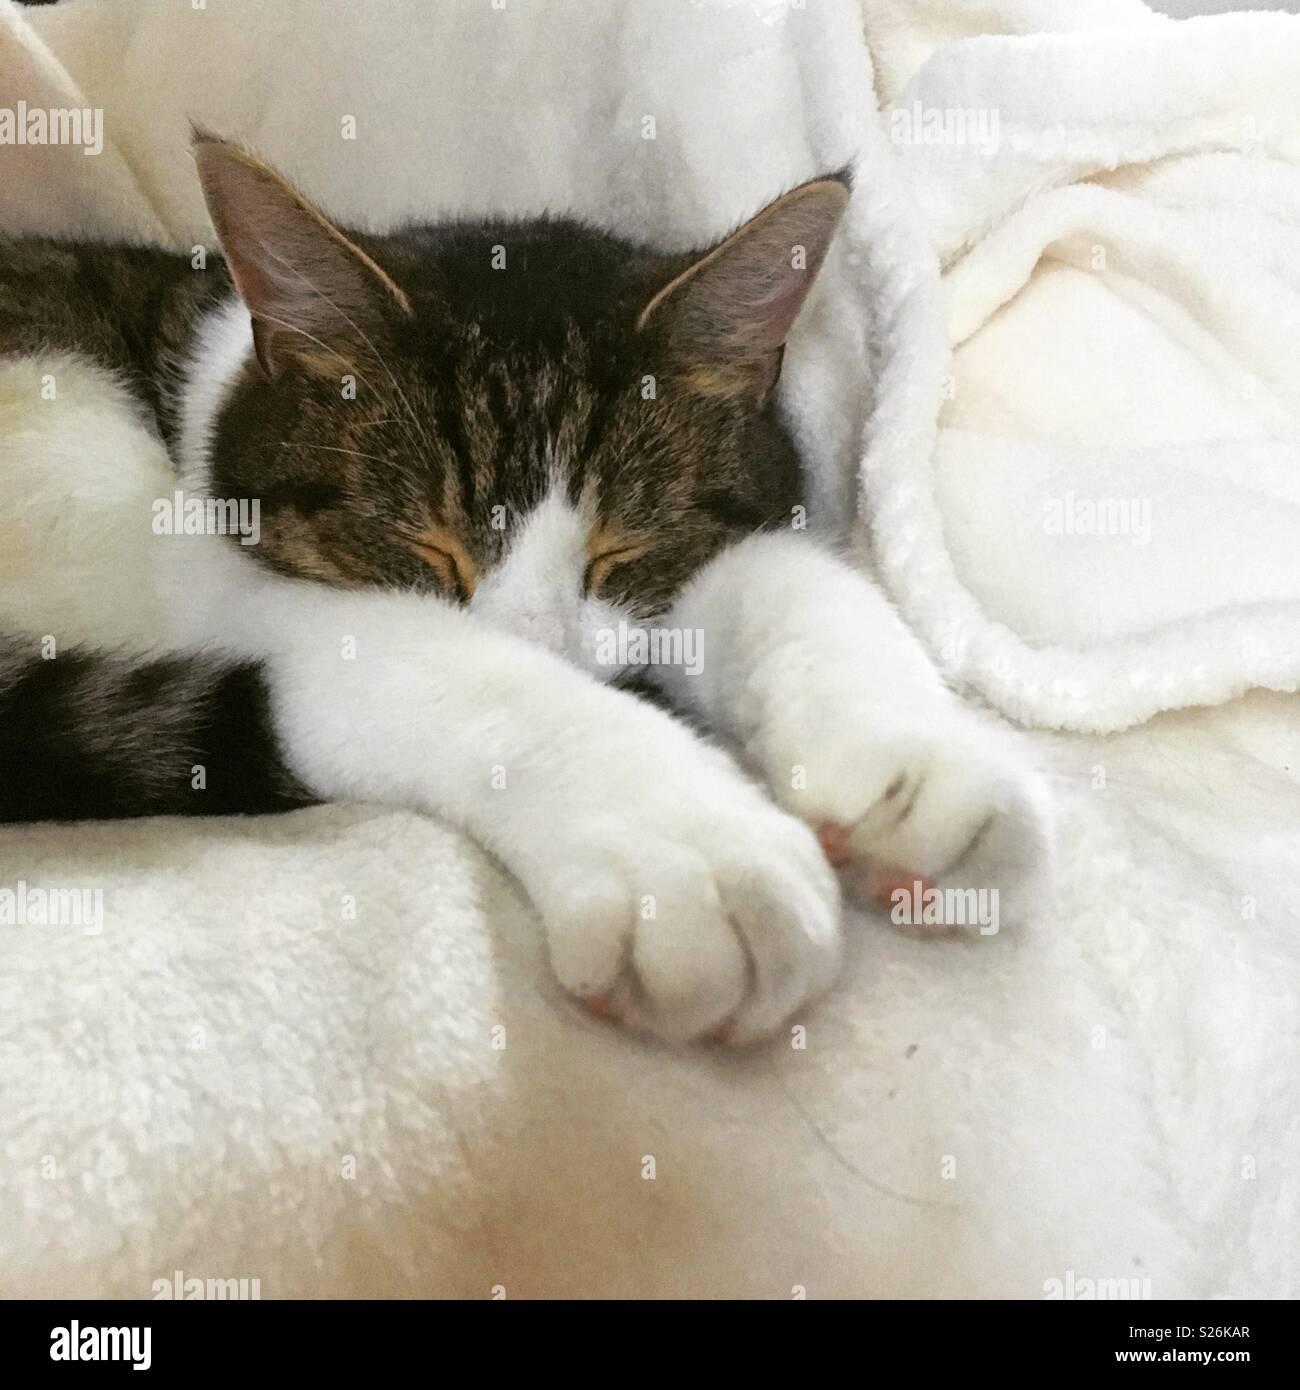 Cat sleeping cosy in white blanket - Stock Image